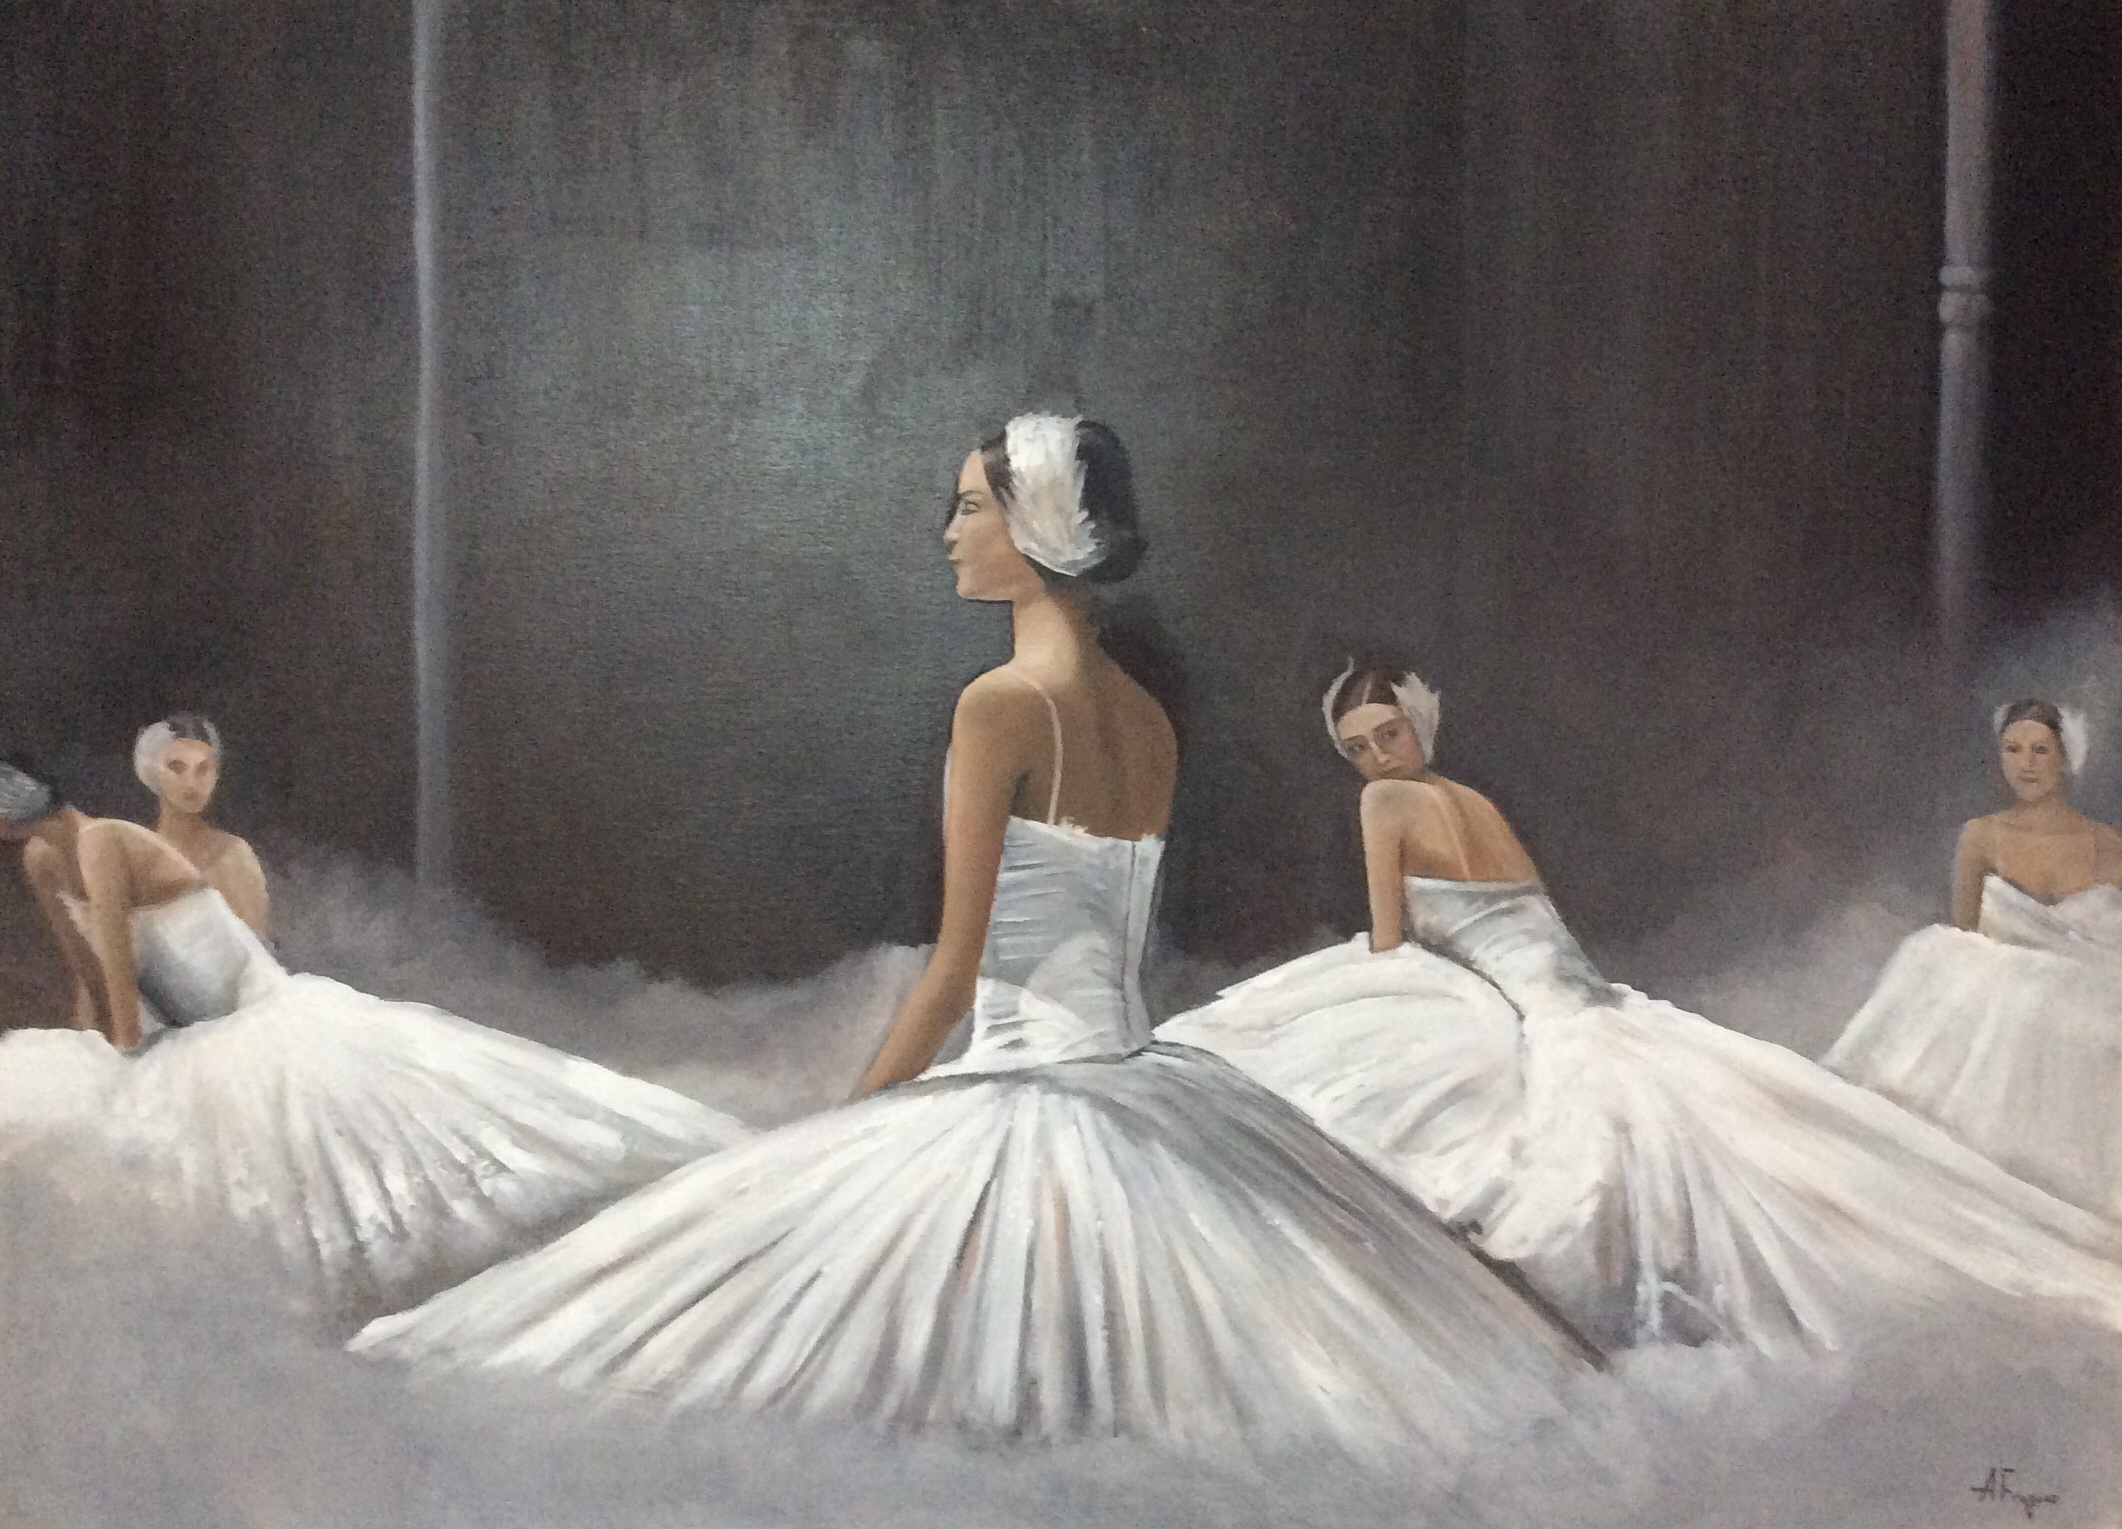 Bailarinas De Ballet., Cuadro Original, Acrílico Sobre